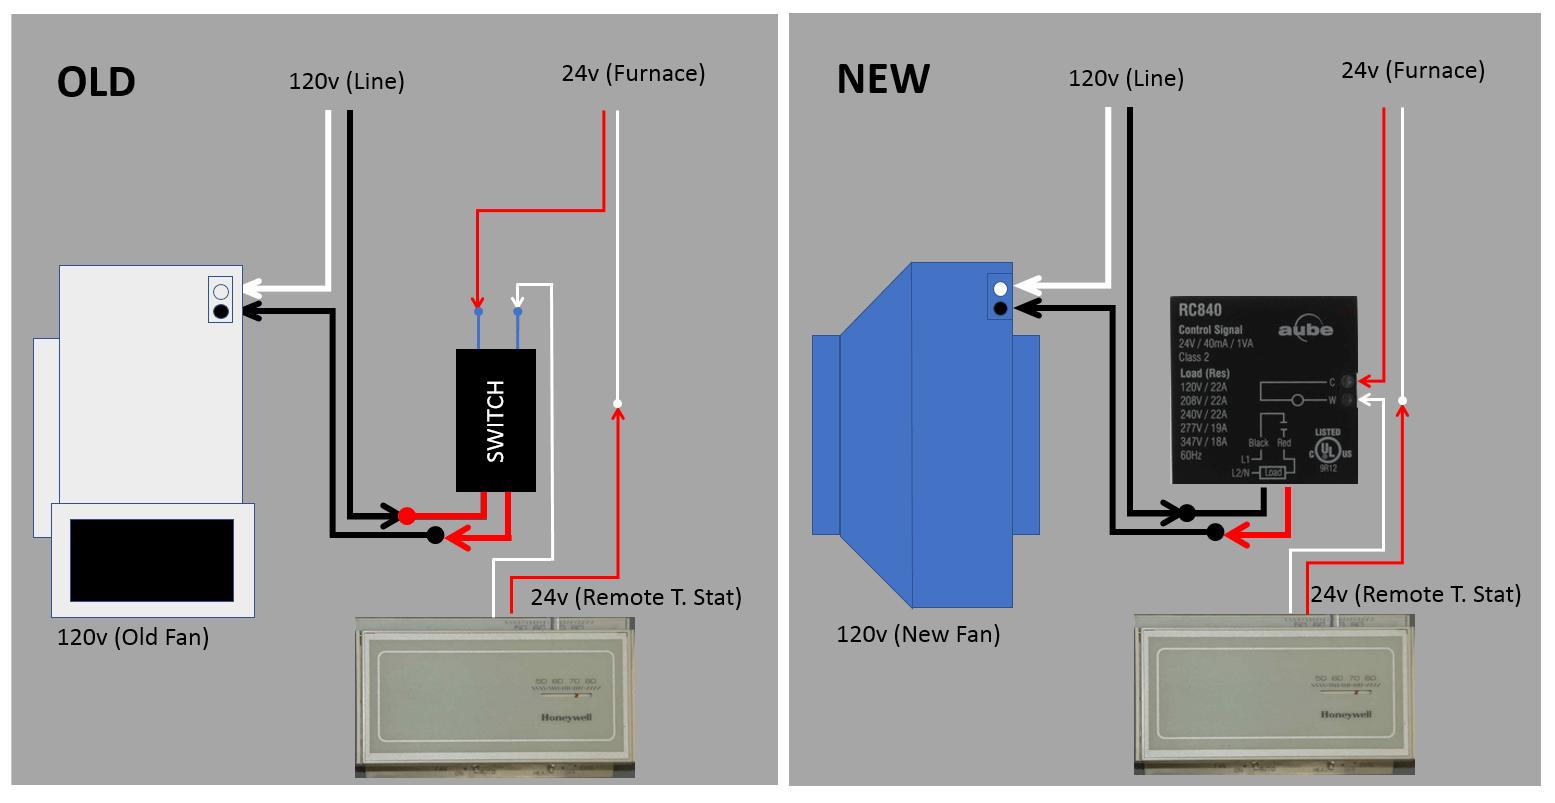 Fedders Furnace Wiring Diagram - Auto Electrical Wiring Diagram on